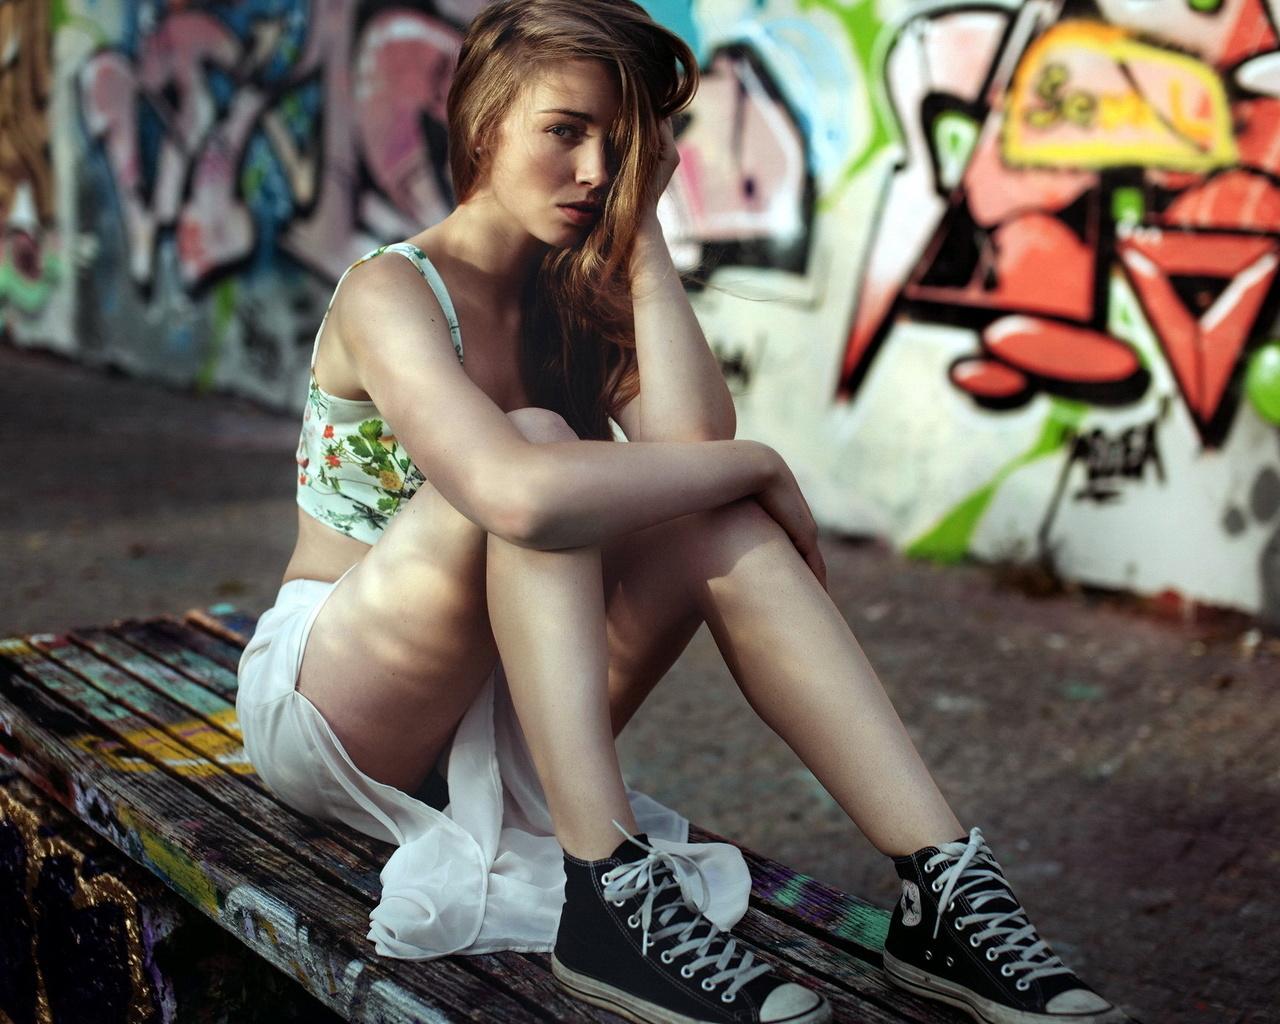 девушка, кеды, лавочка, граффити